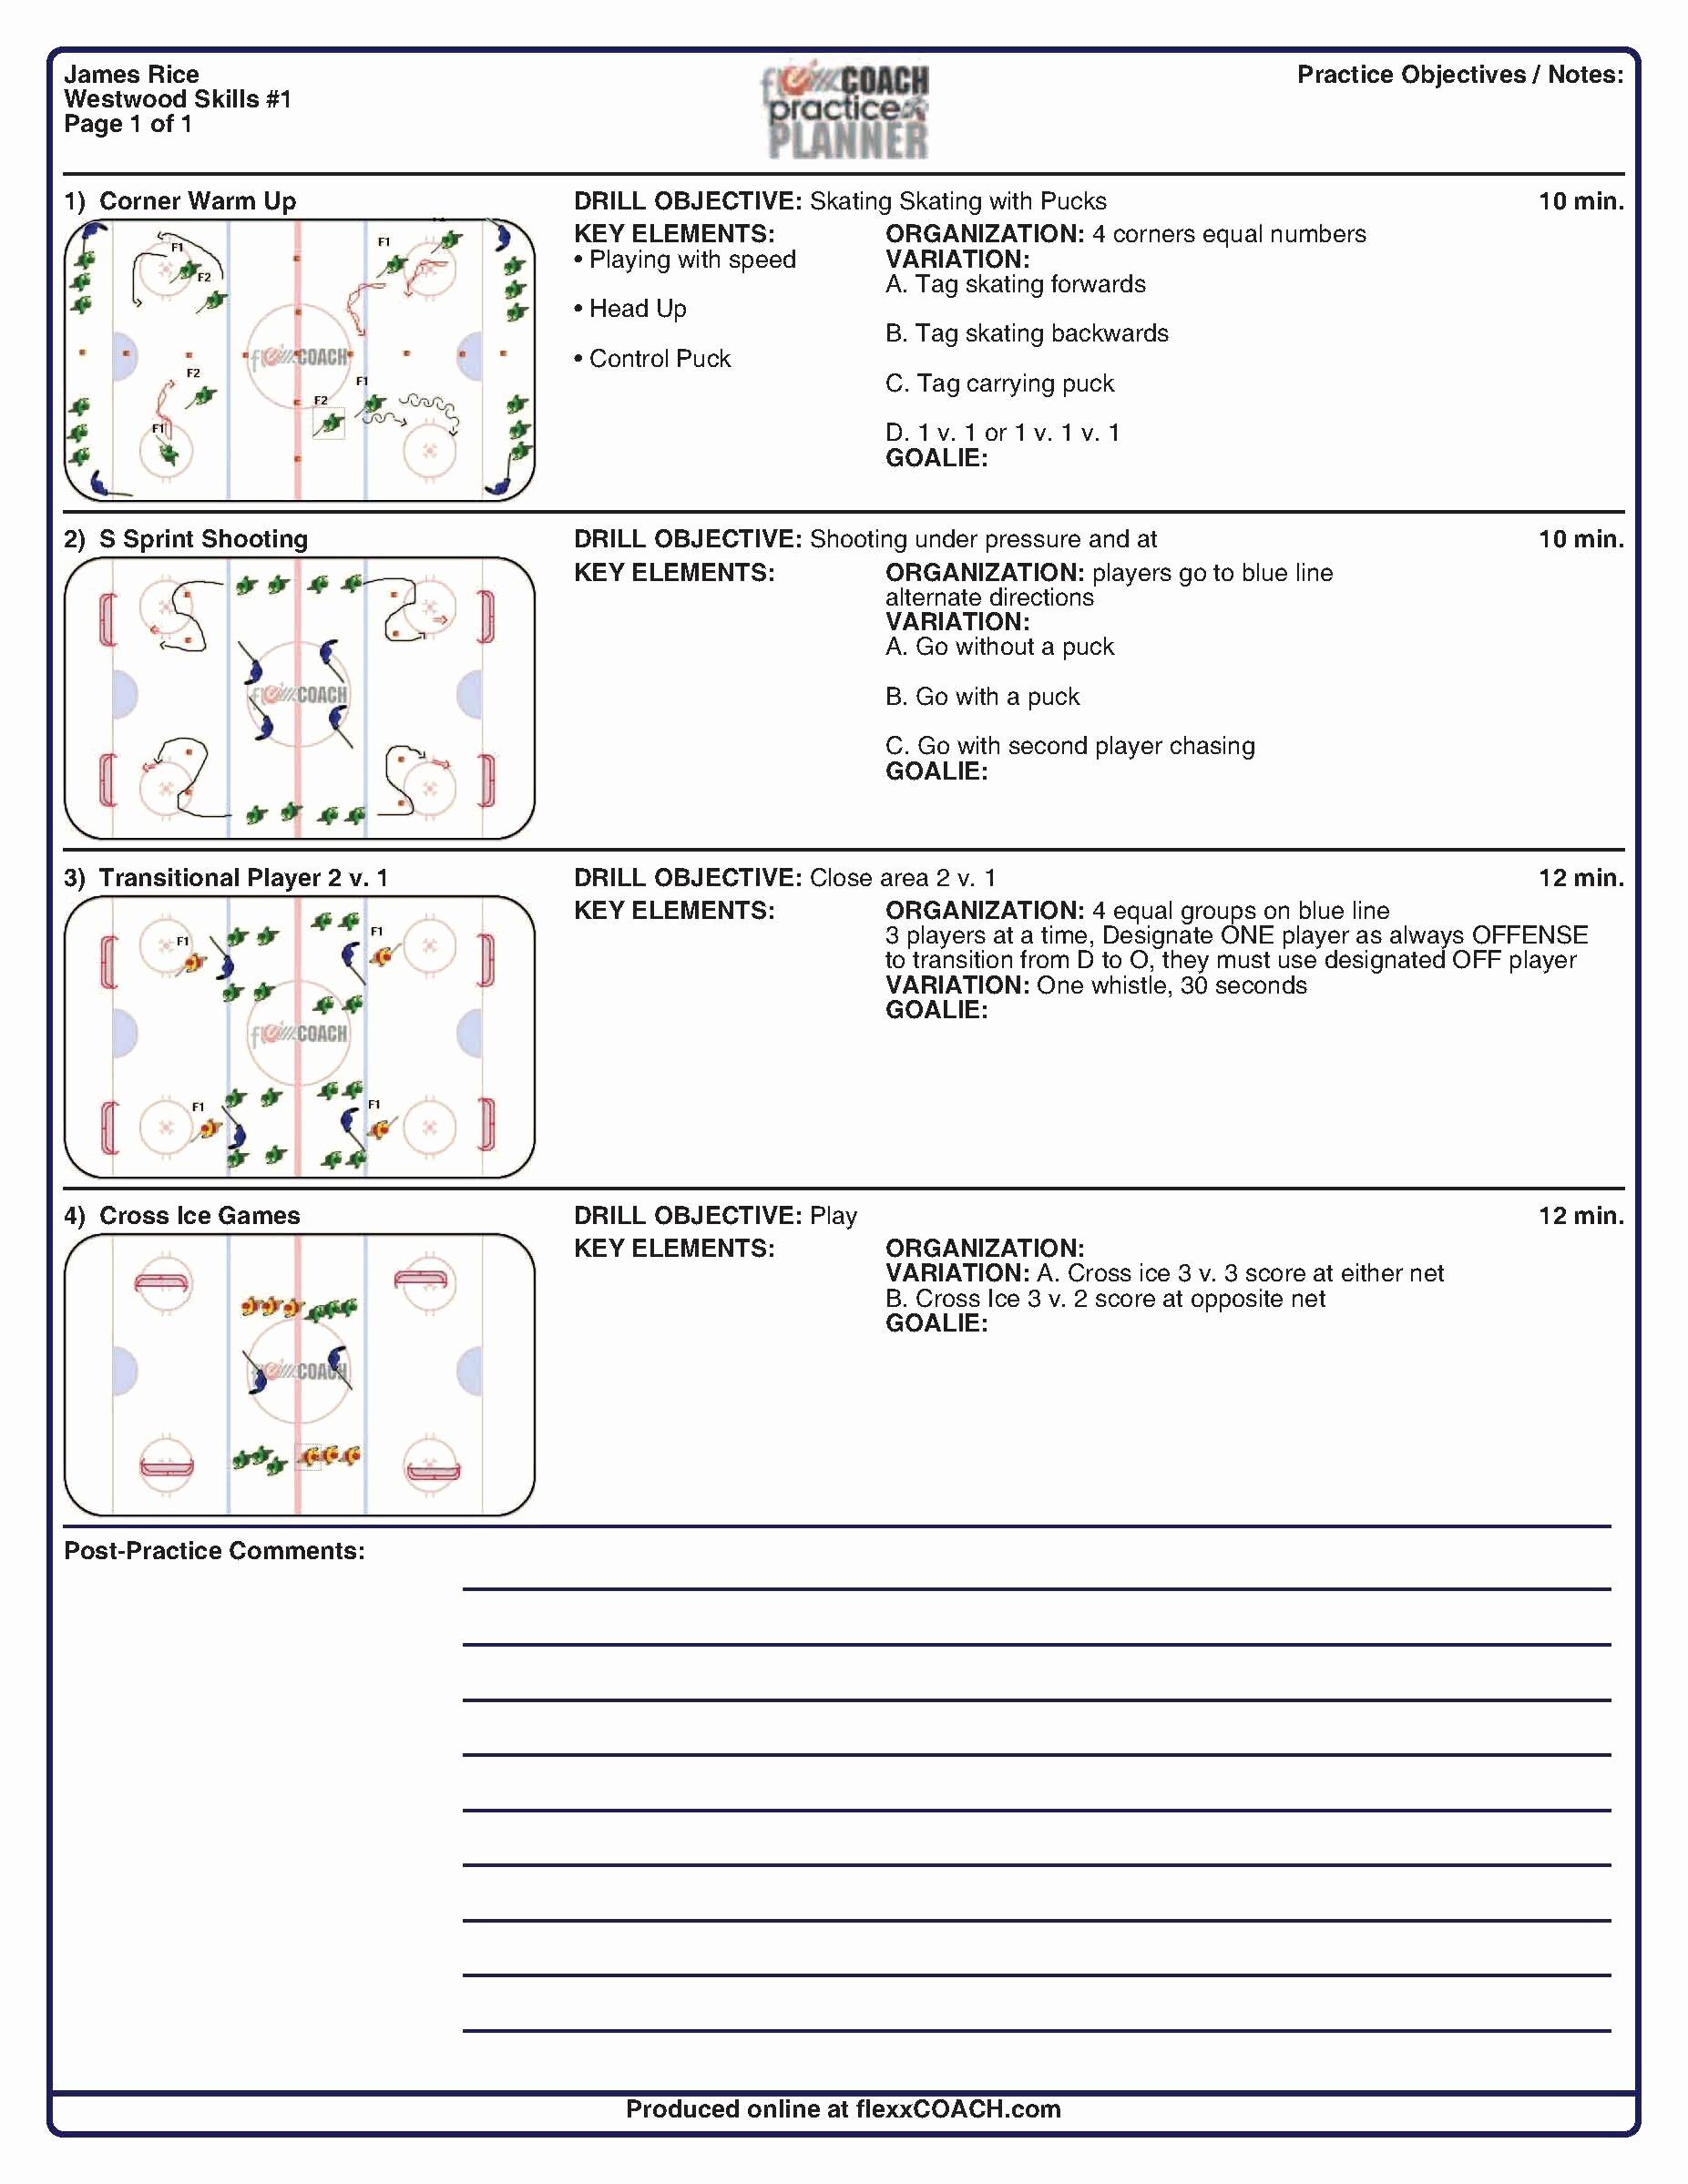 Football Practice Plan Sheet Fresh 001 Football Practice Plan Template Excel Sheet for Lovely